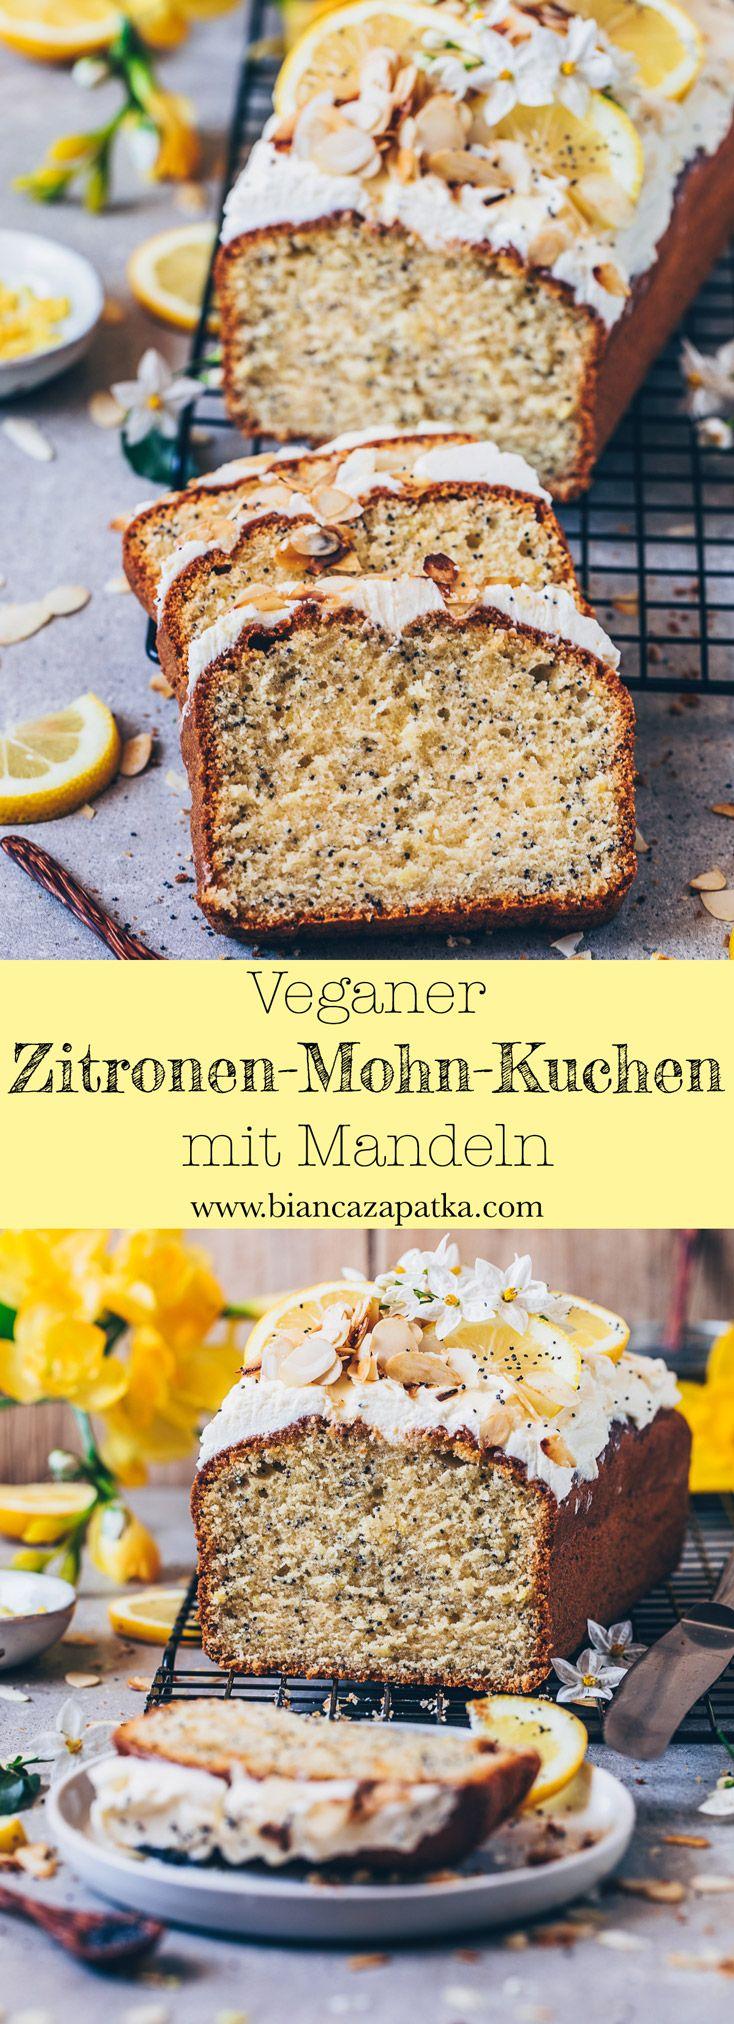 Zitronen-Mohn-Kuchen (Vegan, einfach, lecker) - Bianca Zapatka | Rezepte